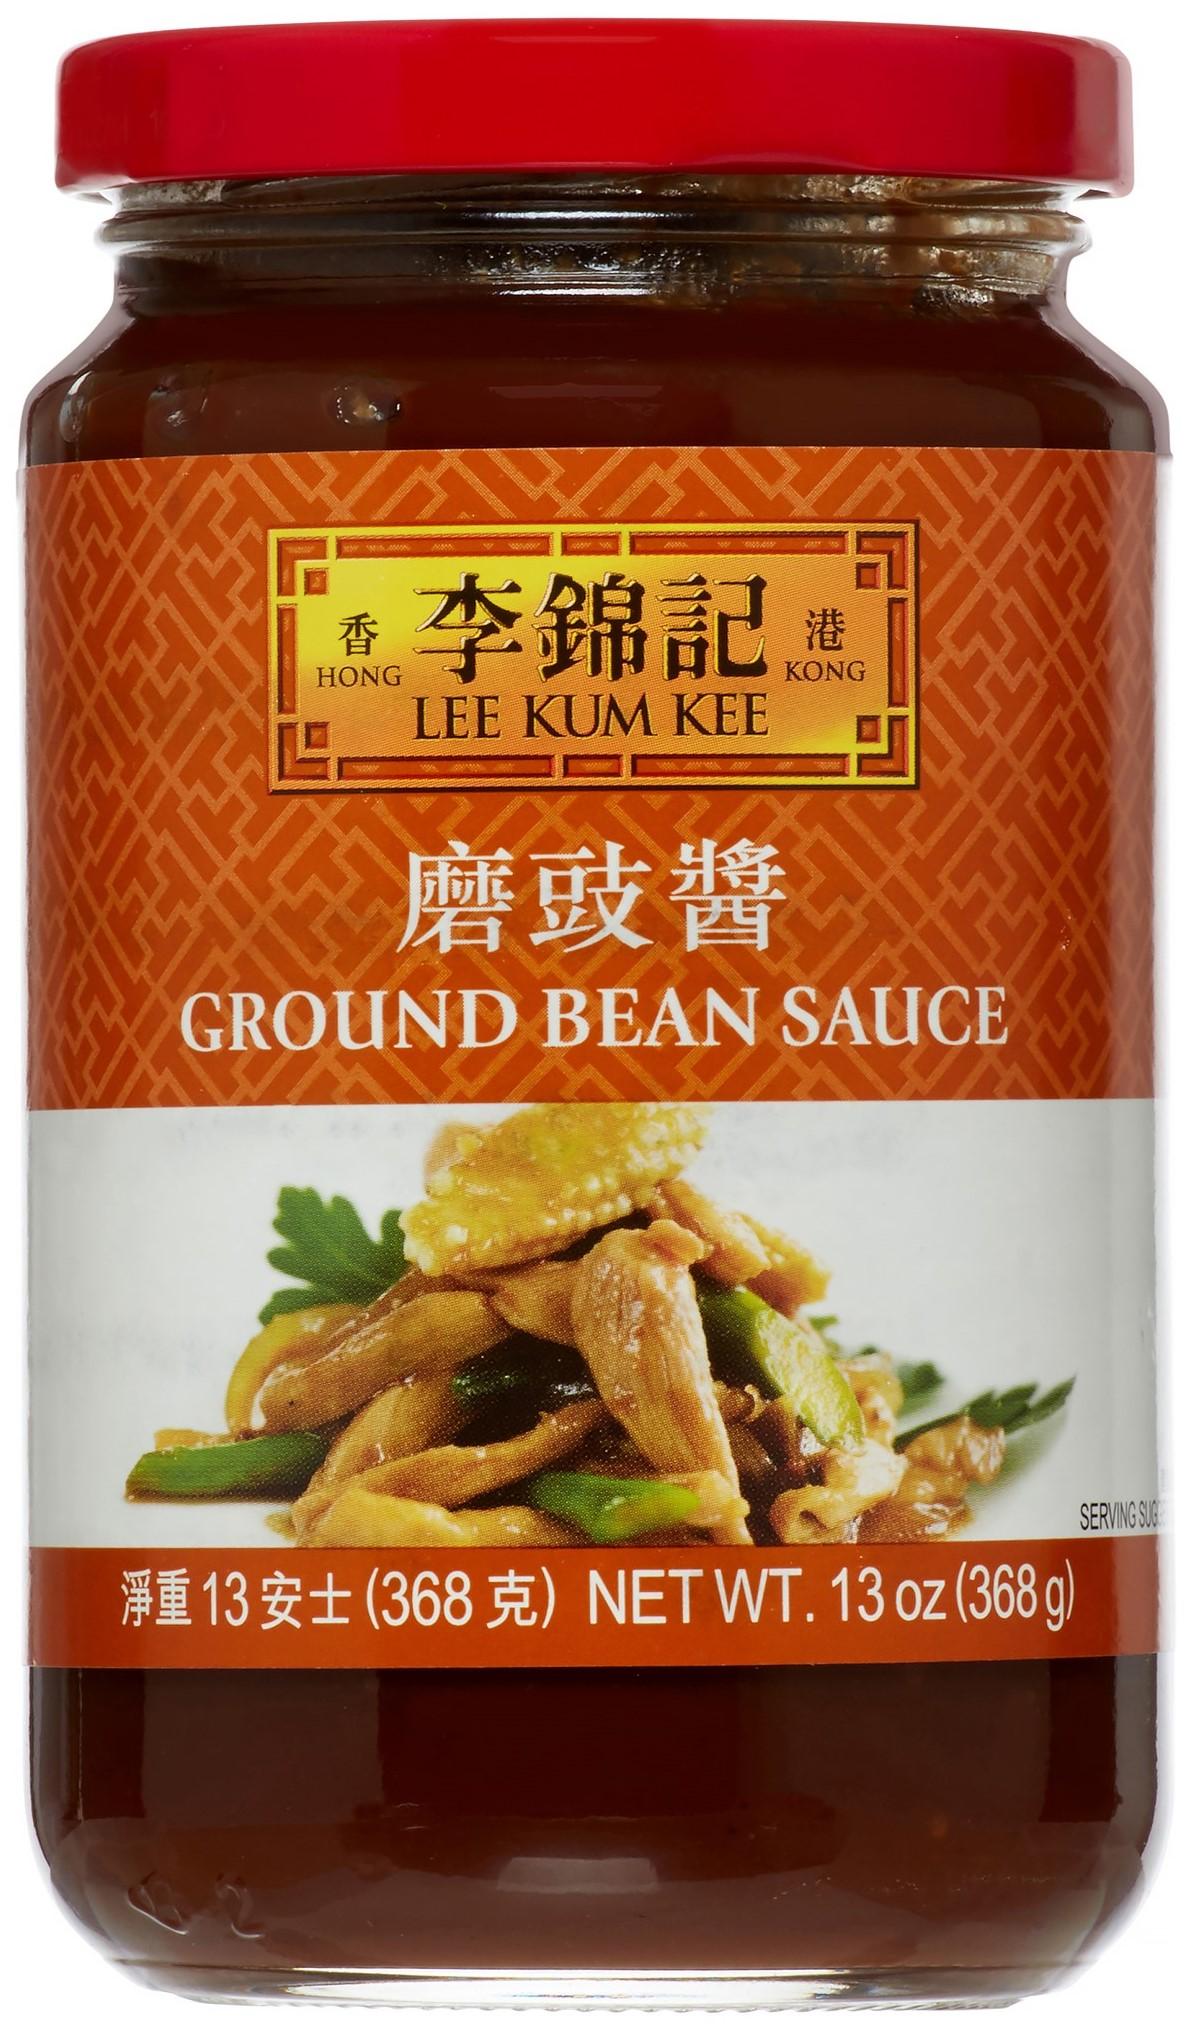 Lee Kum Kee Ground Bean Sauce 13 Oz